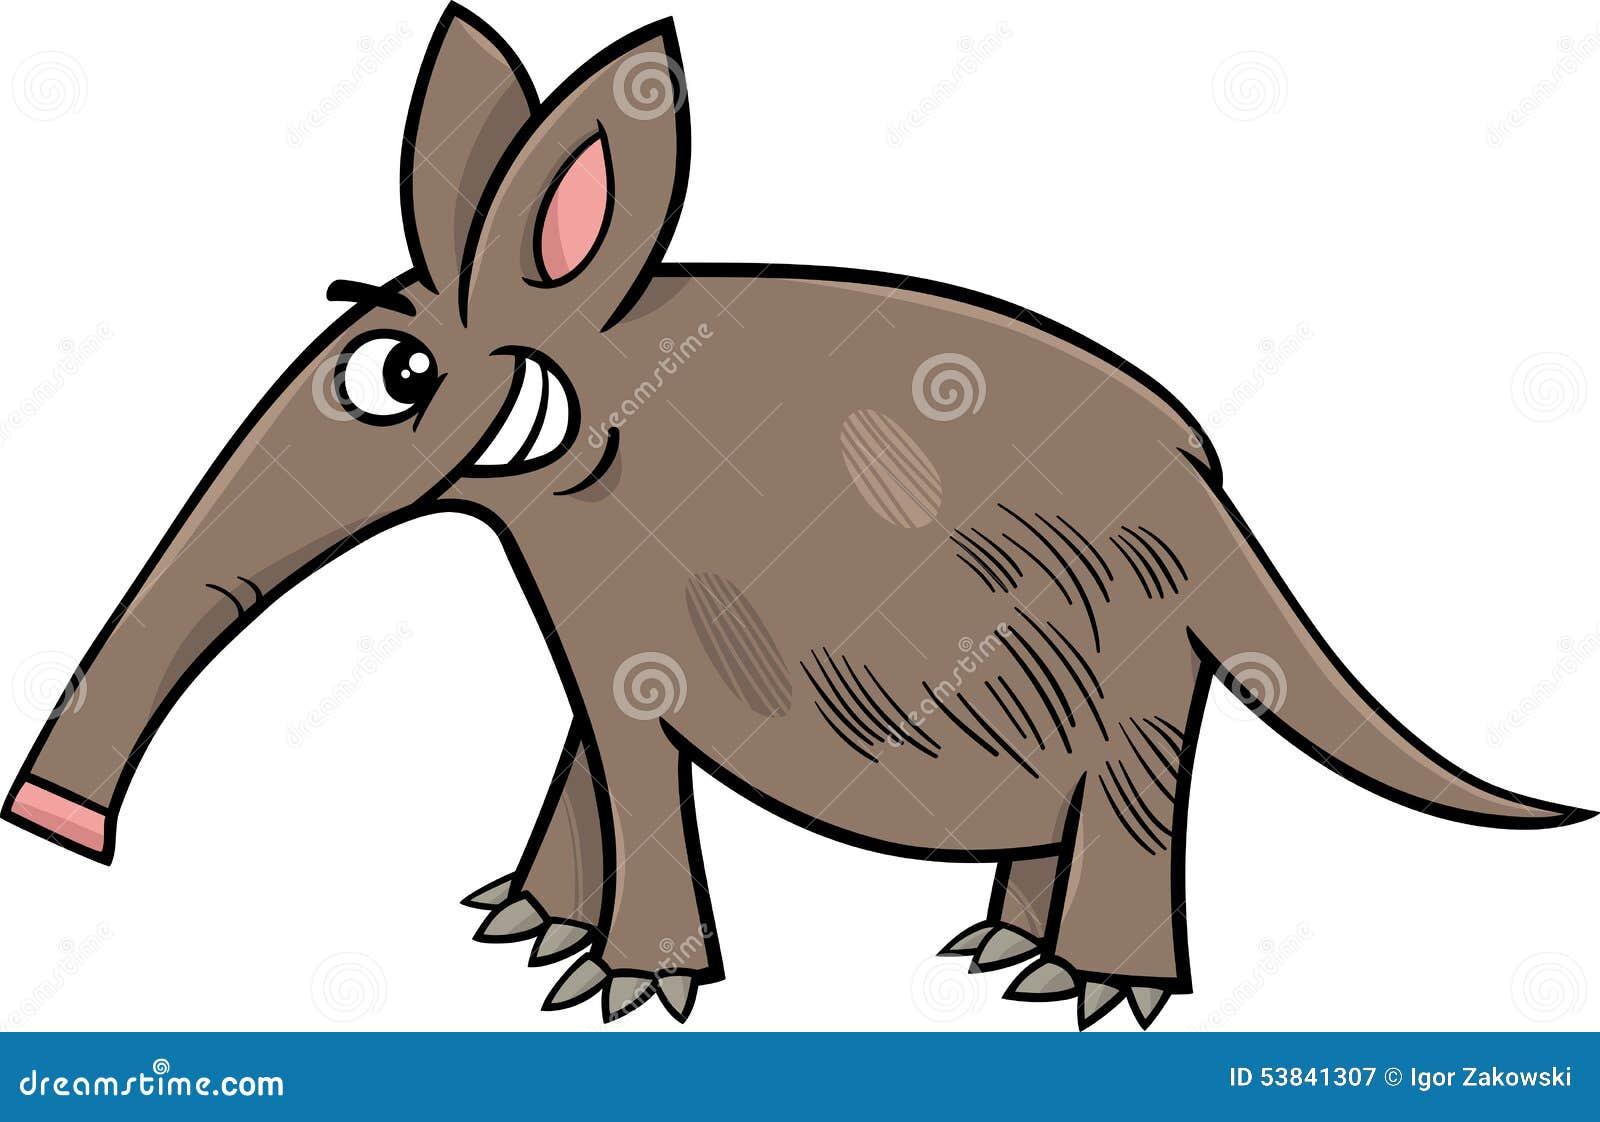 Aardvark Animal Cartoon Illustration Stock Vector - Image: 53841307